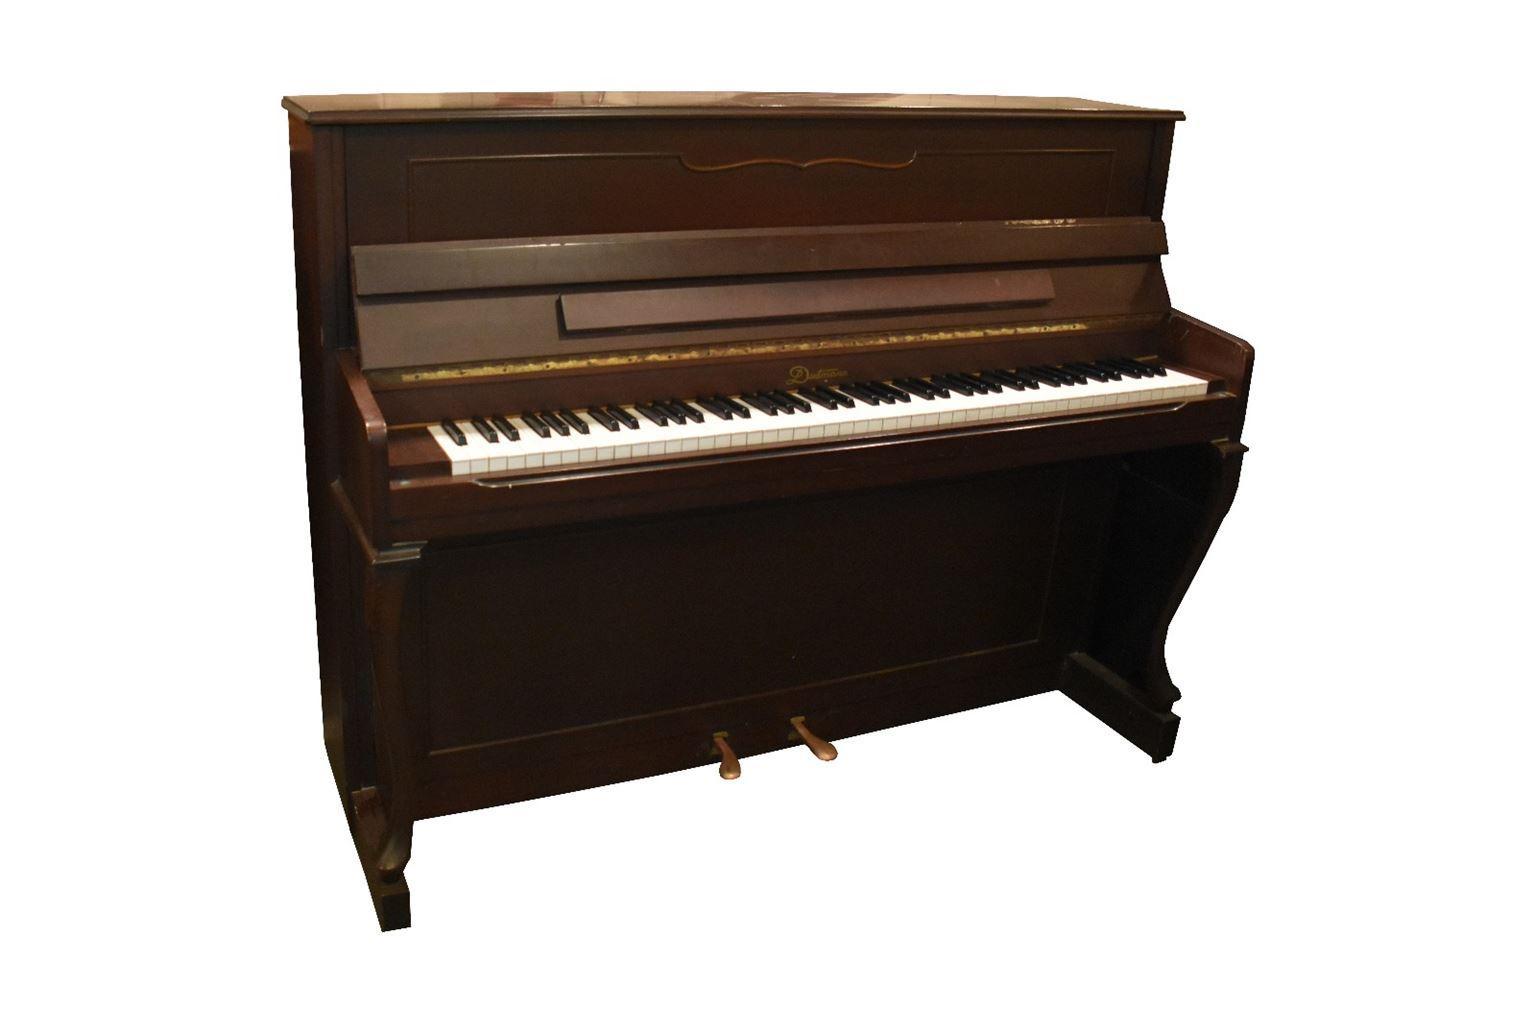 מרענן פסנתרי קיר - בית הפסנתר IX-77